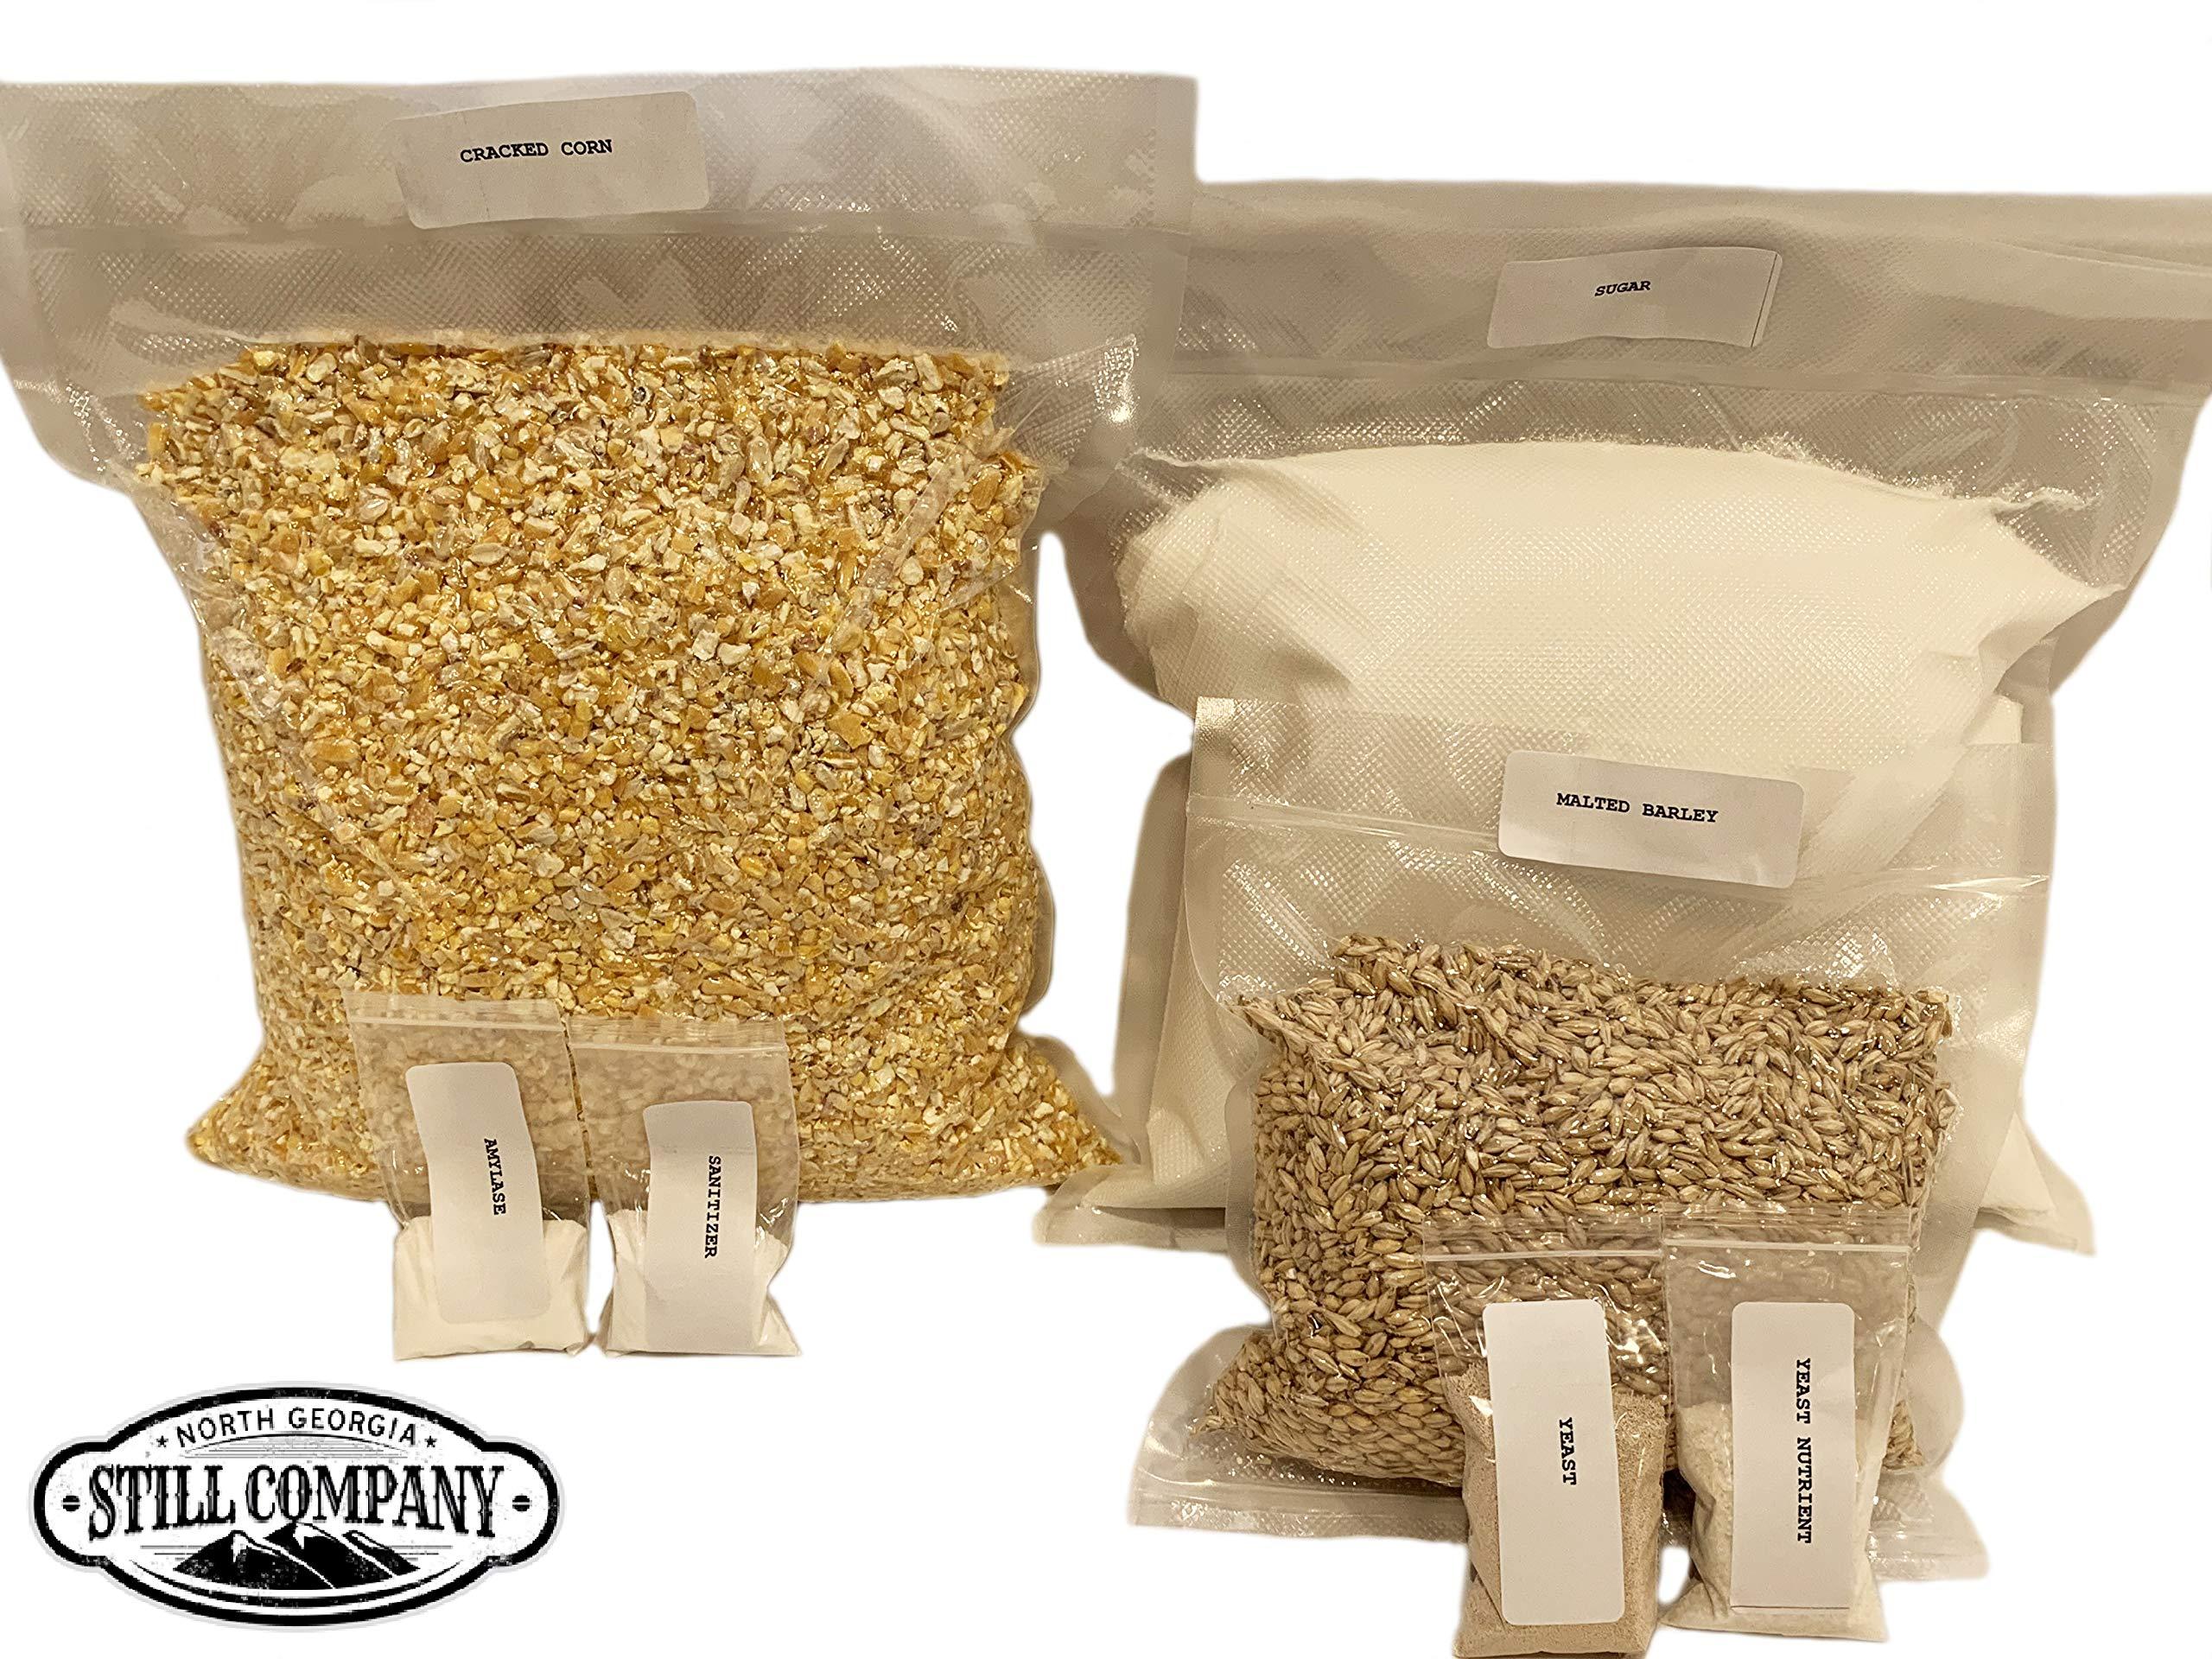 Complete Cracked Corn, Malted Barley Whiskey Mash & Fermentation Kit by North Georgia Still Company